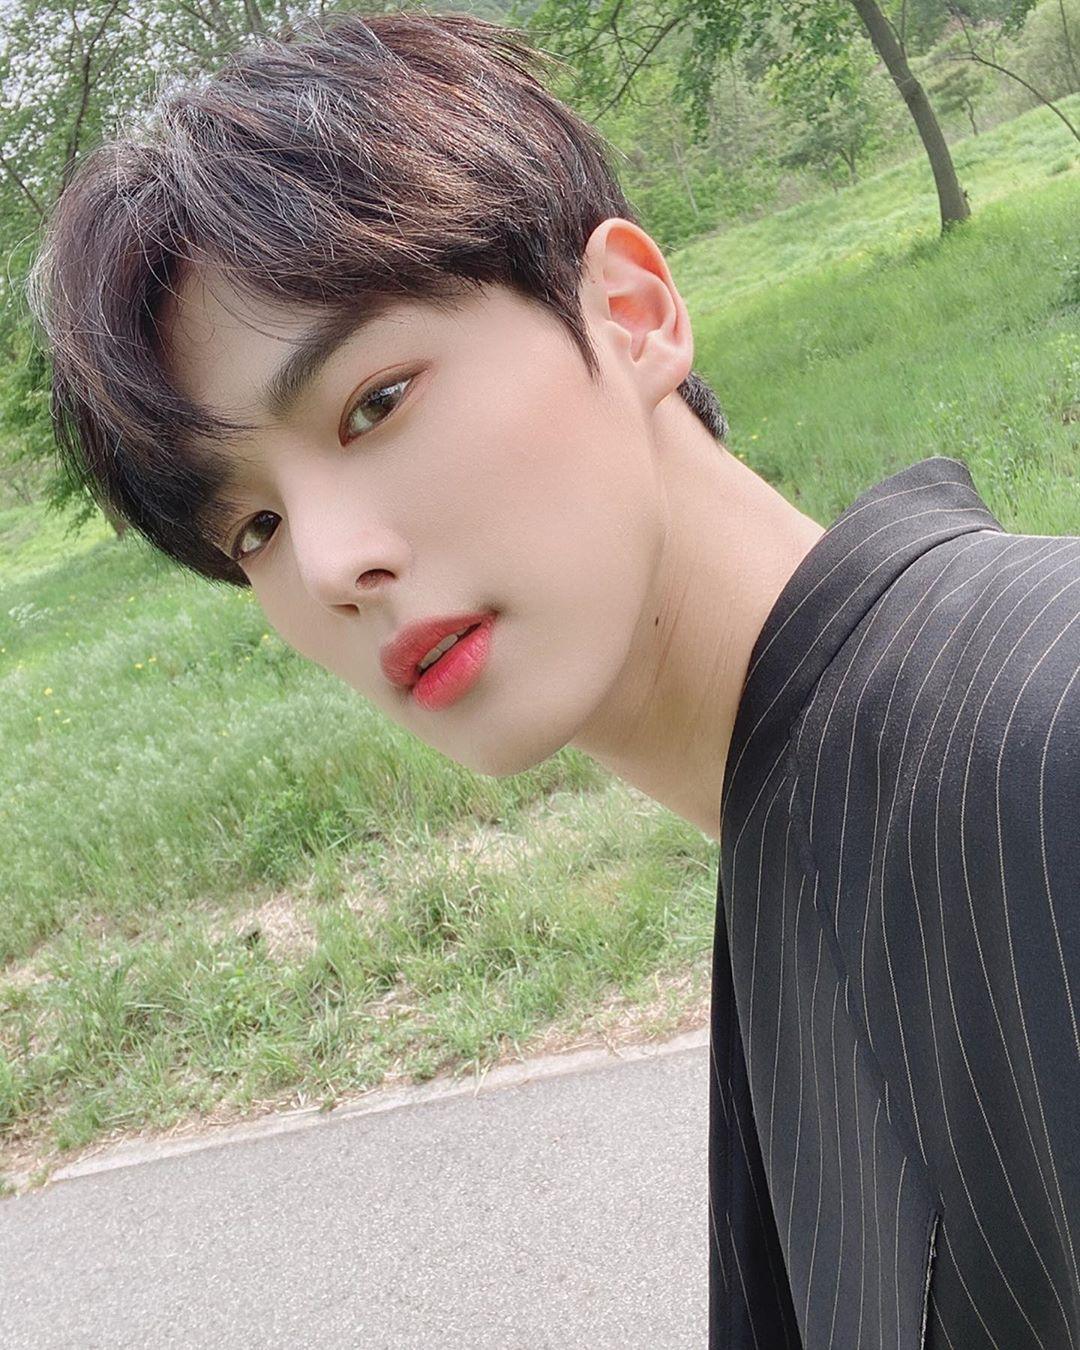 20+ Asian guys with earrings ideas in 2021